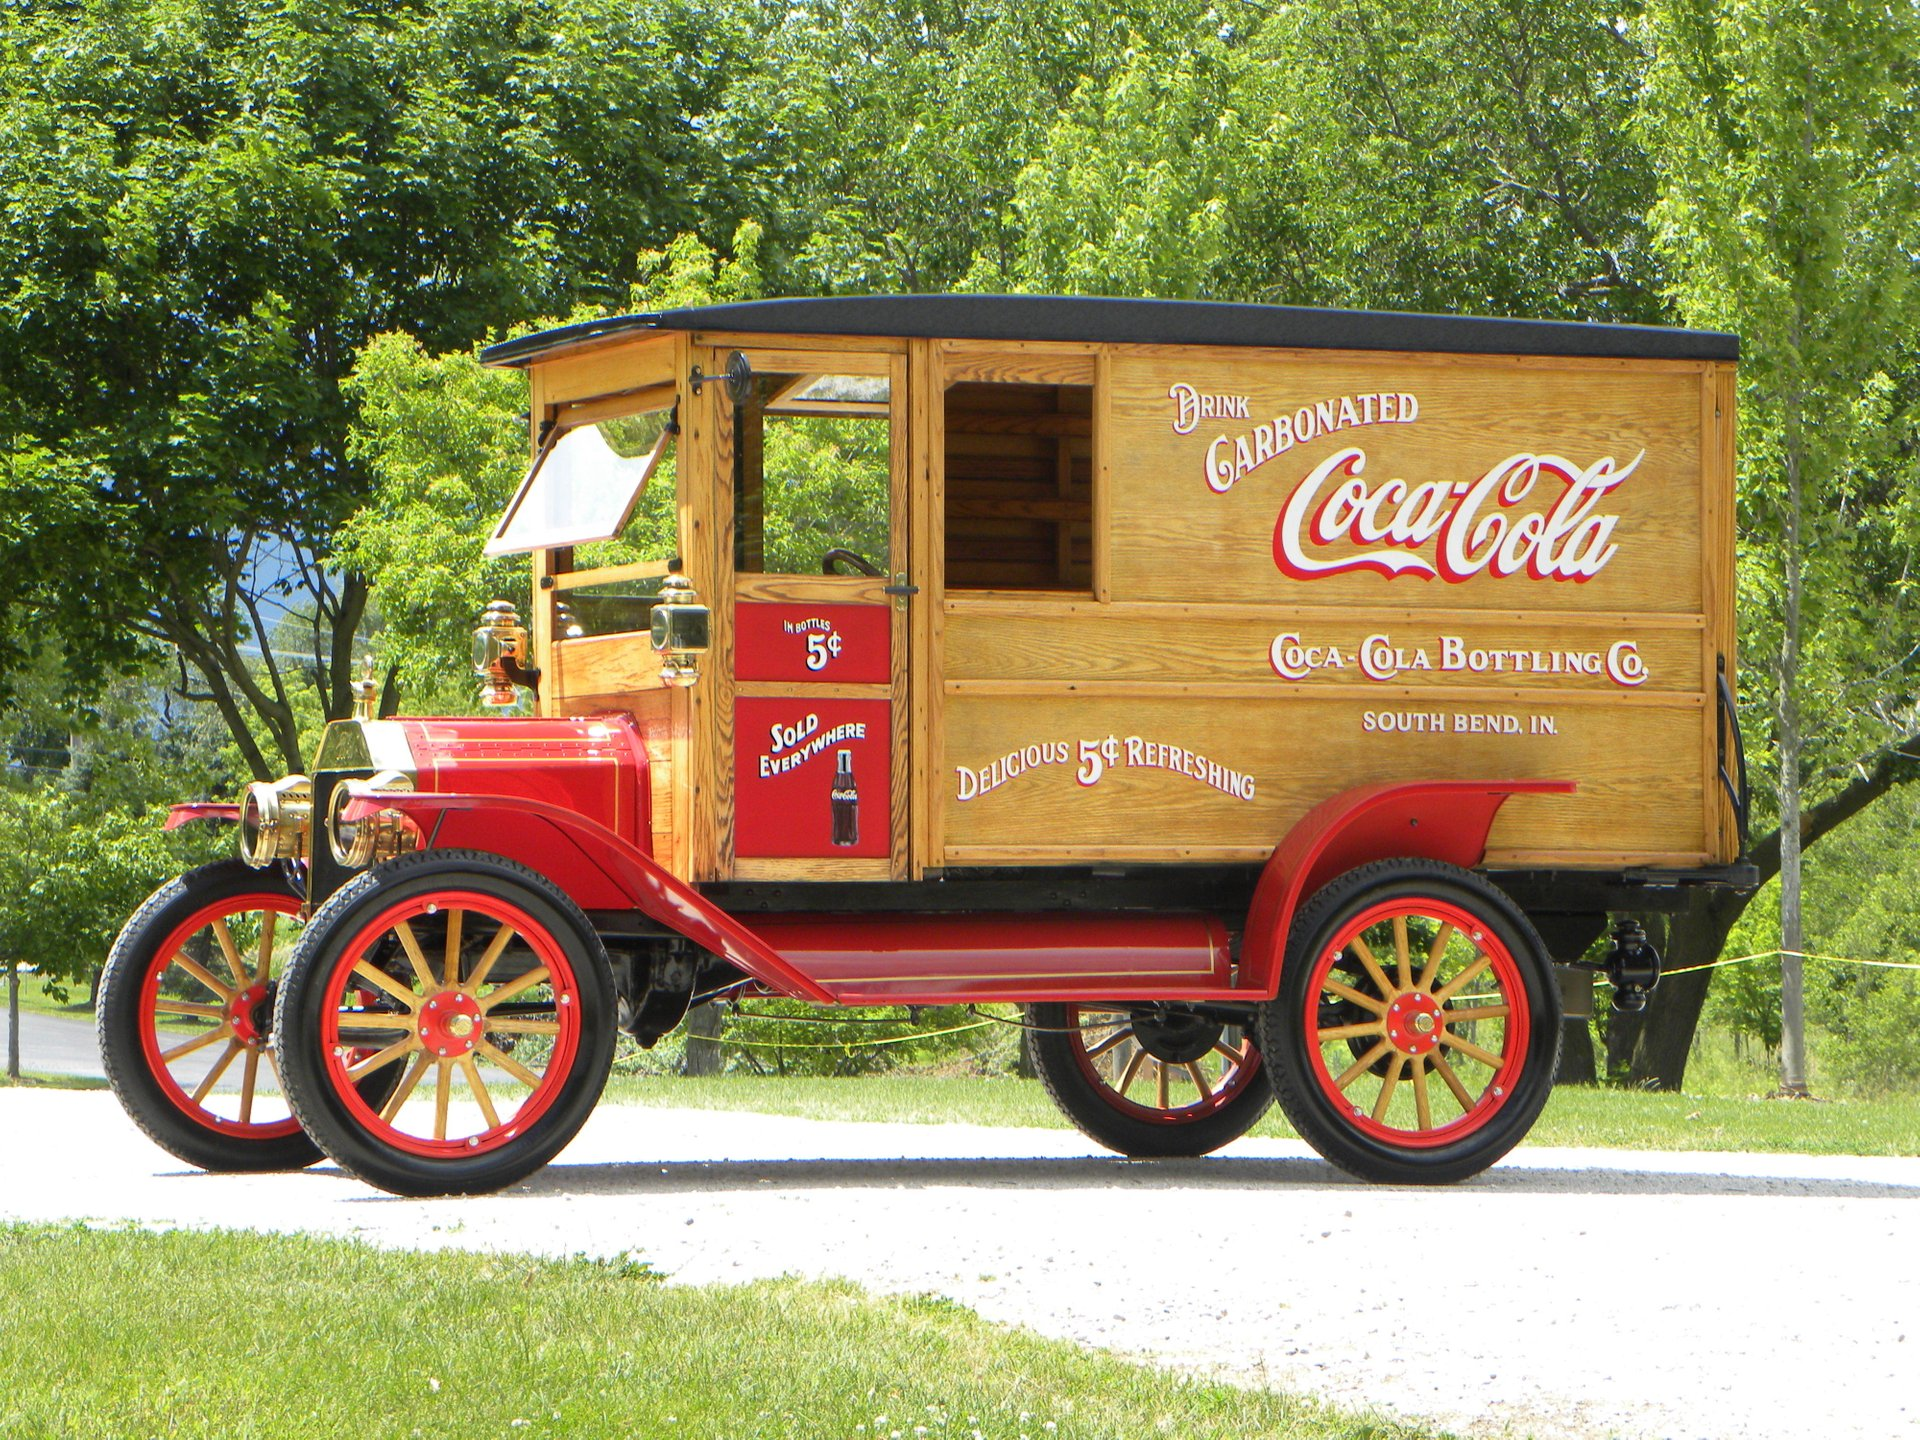 1912 ford model t coca cola delivery truck